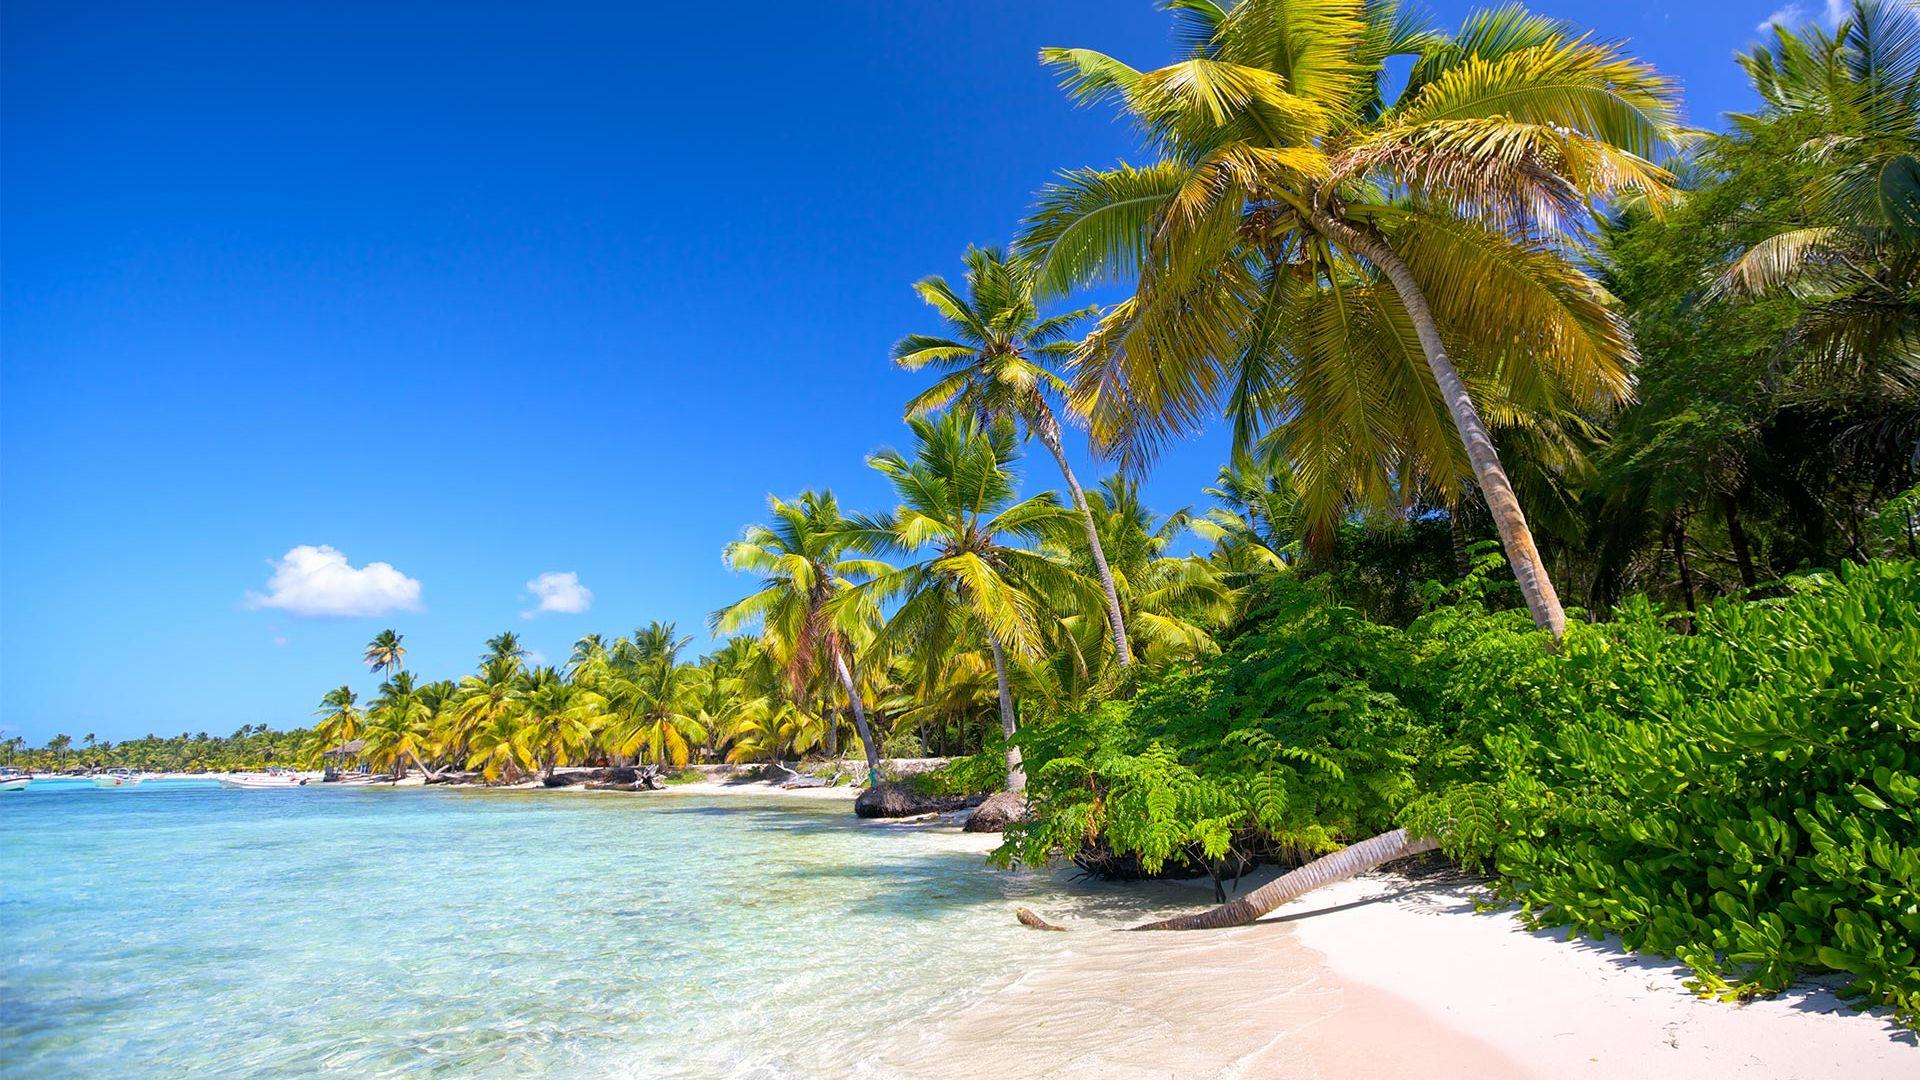 Sejur plaja Punta Cana, 9 zile - mai 2022